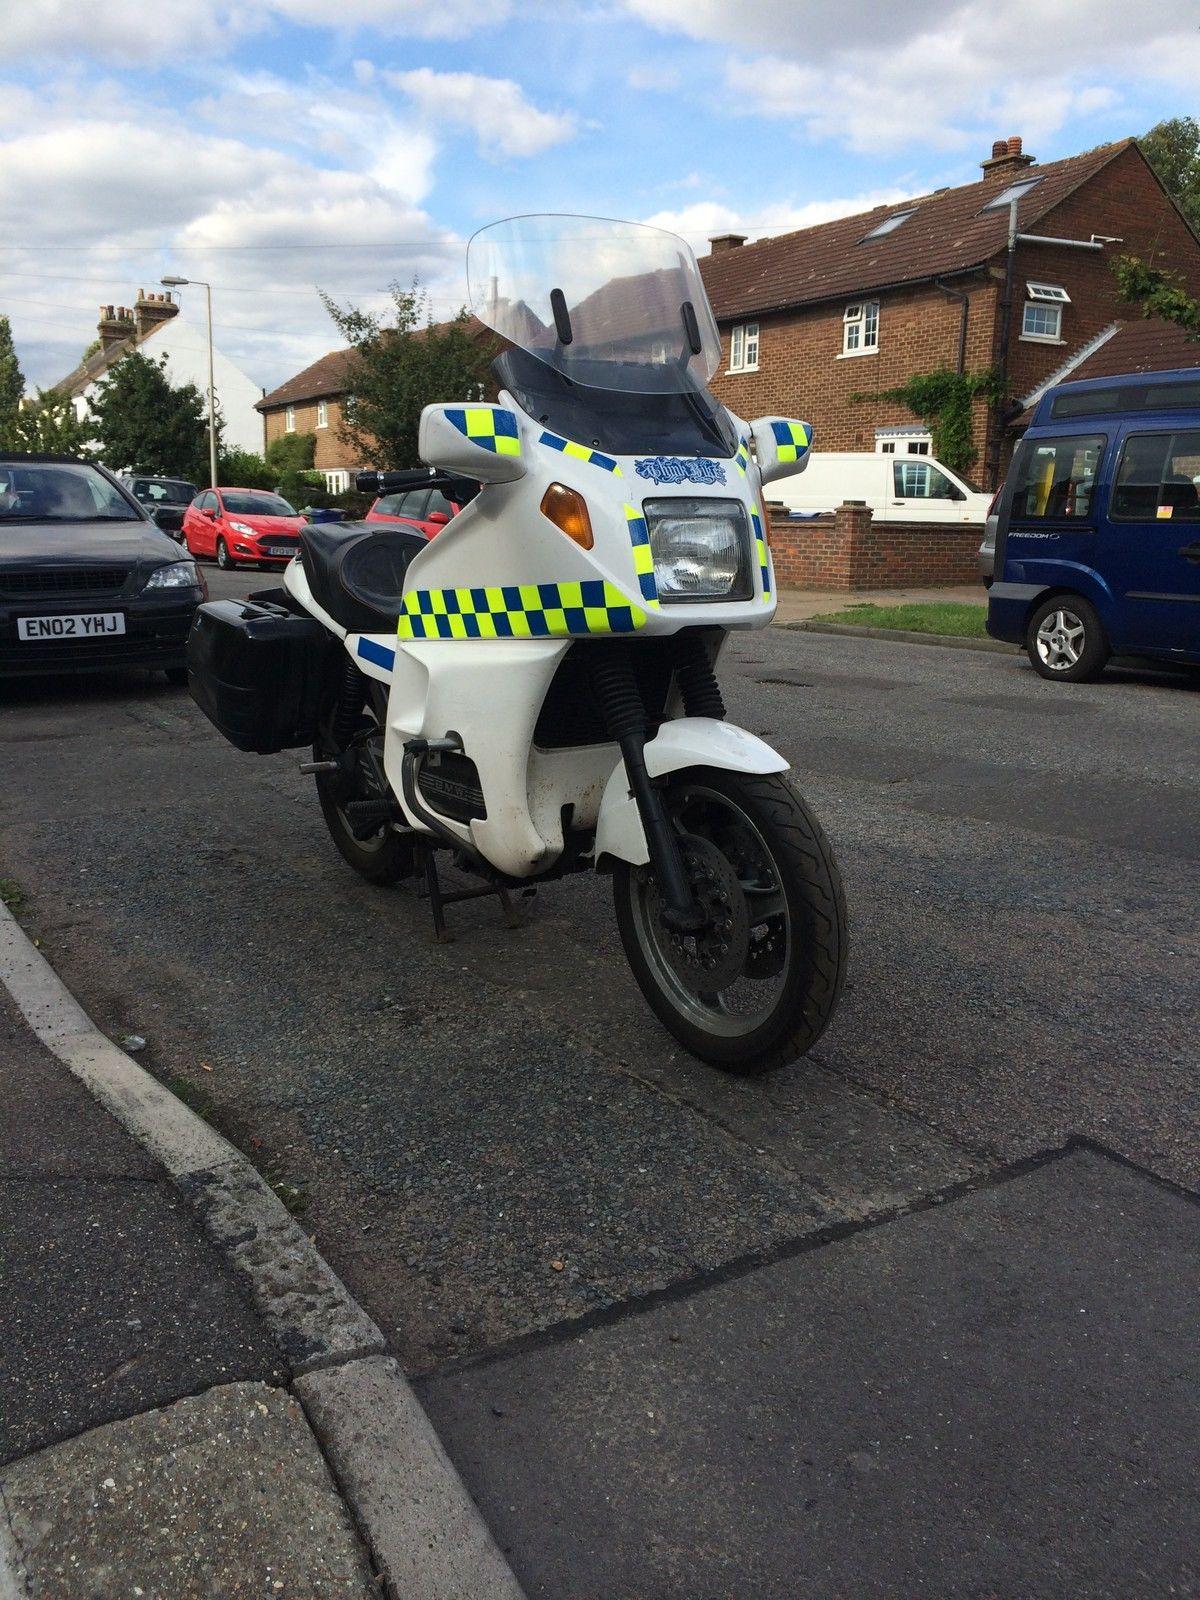 65258 bmw k1100 lt looks like police bike and luggage shaft abs hack long  mot